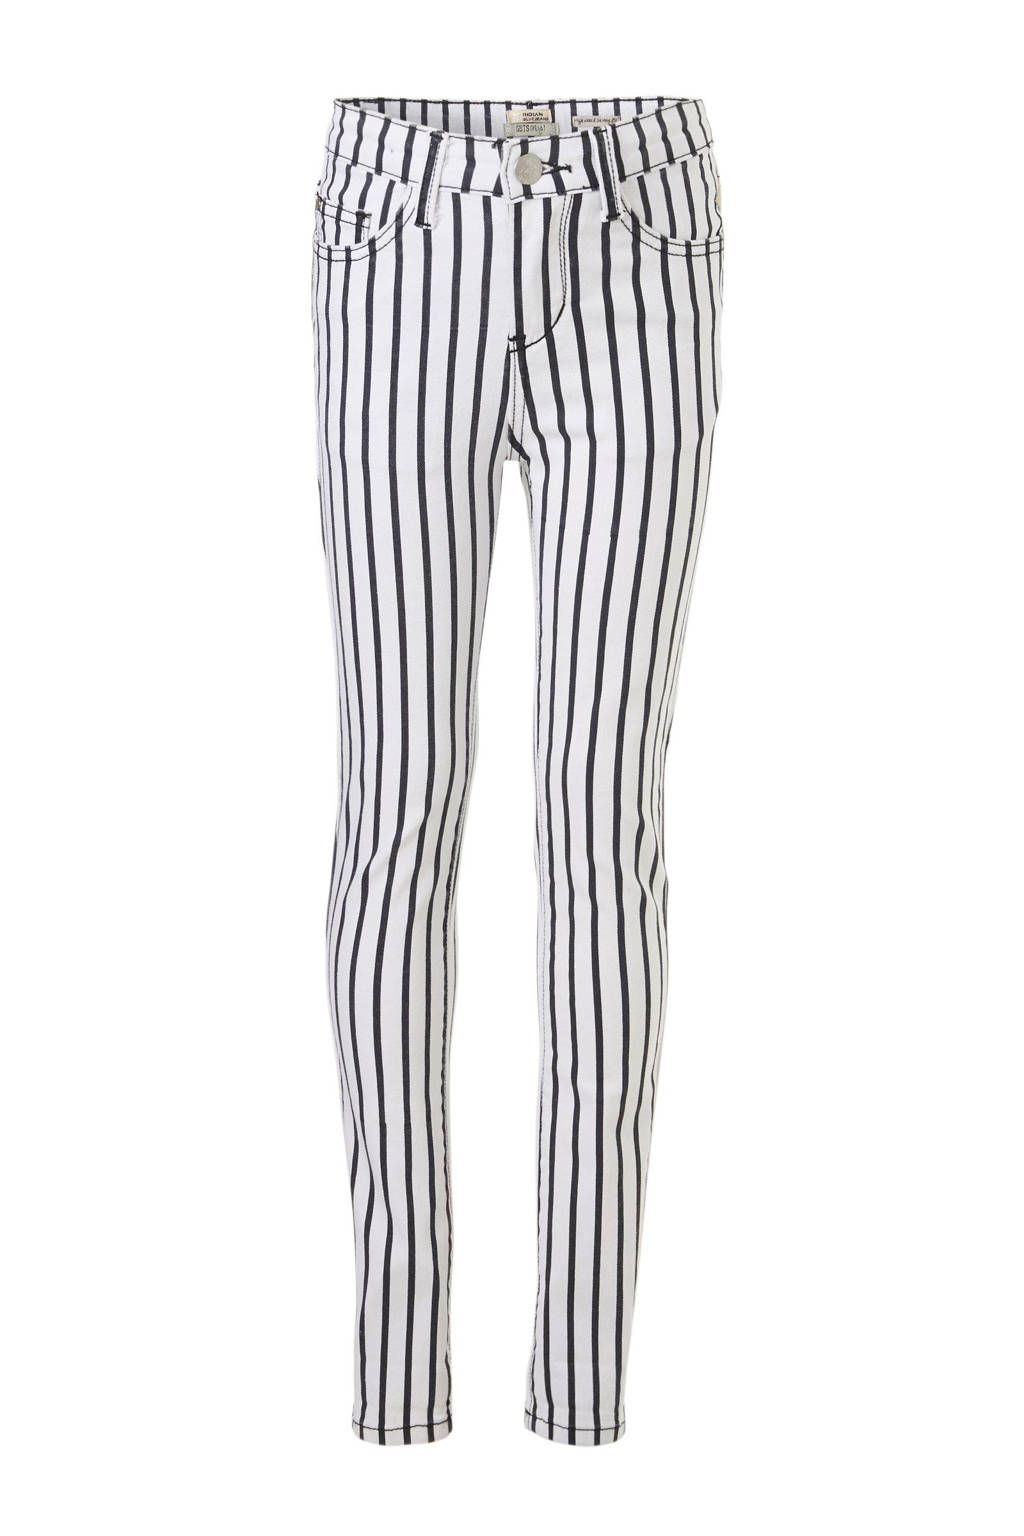 Indian Blue Jeans gestreepte broek met hoge taille Lois, Wit/zwart